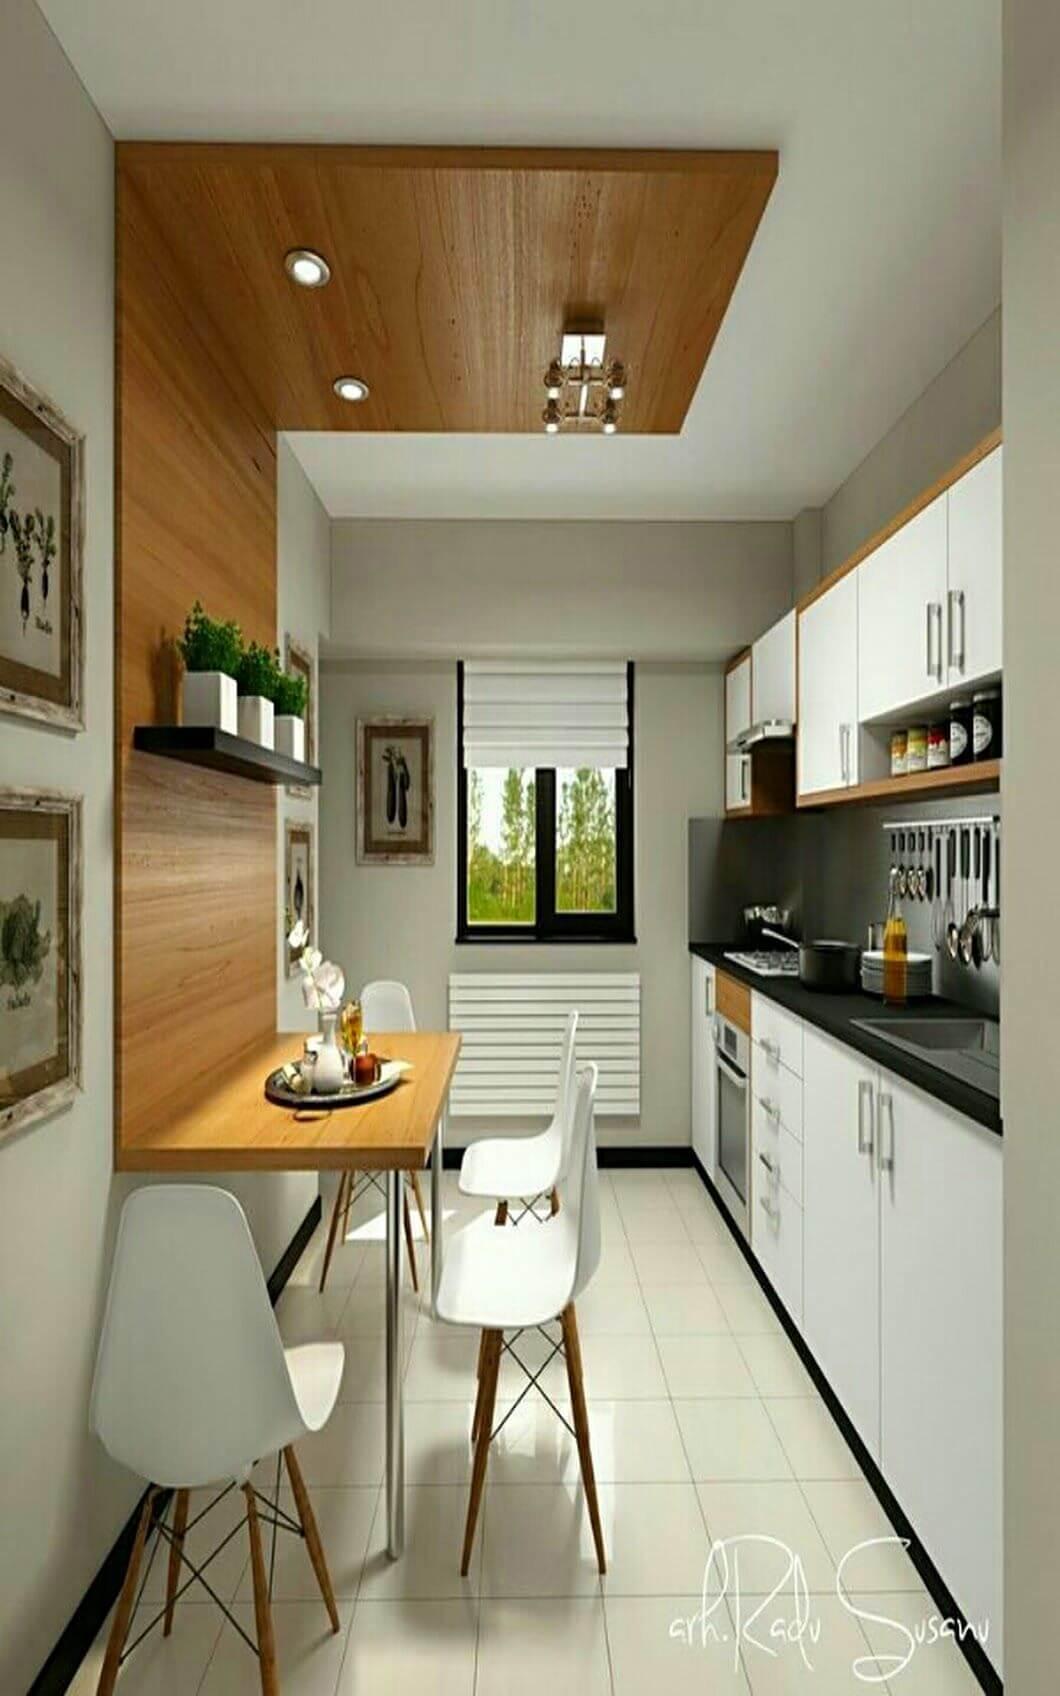 kitchen decor ideas diy - 1. Kitchen Decor Ideas in Apartment - Harptimes.com